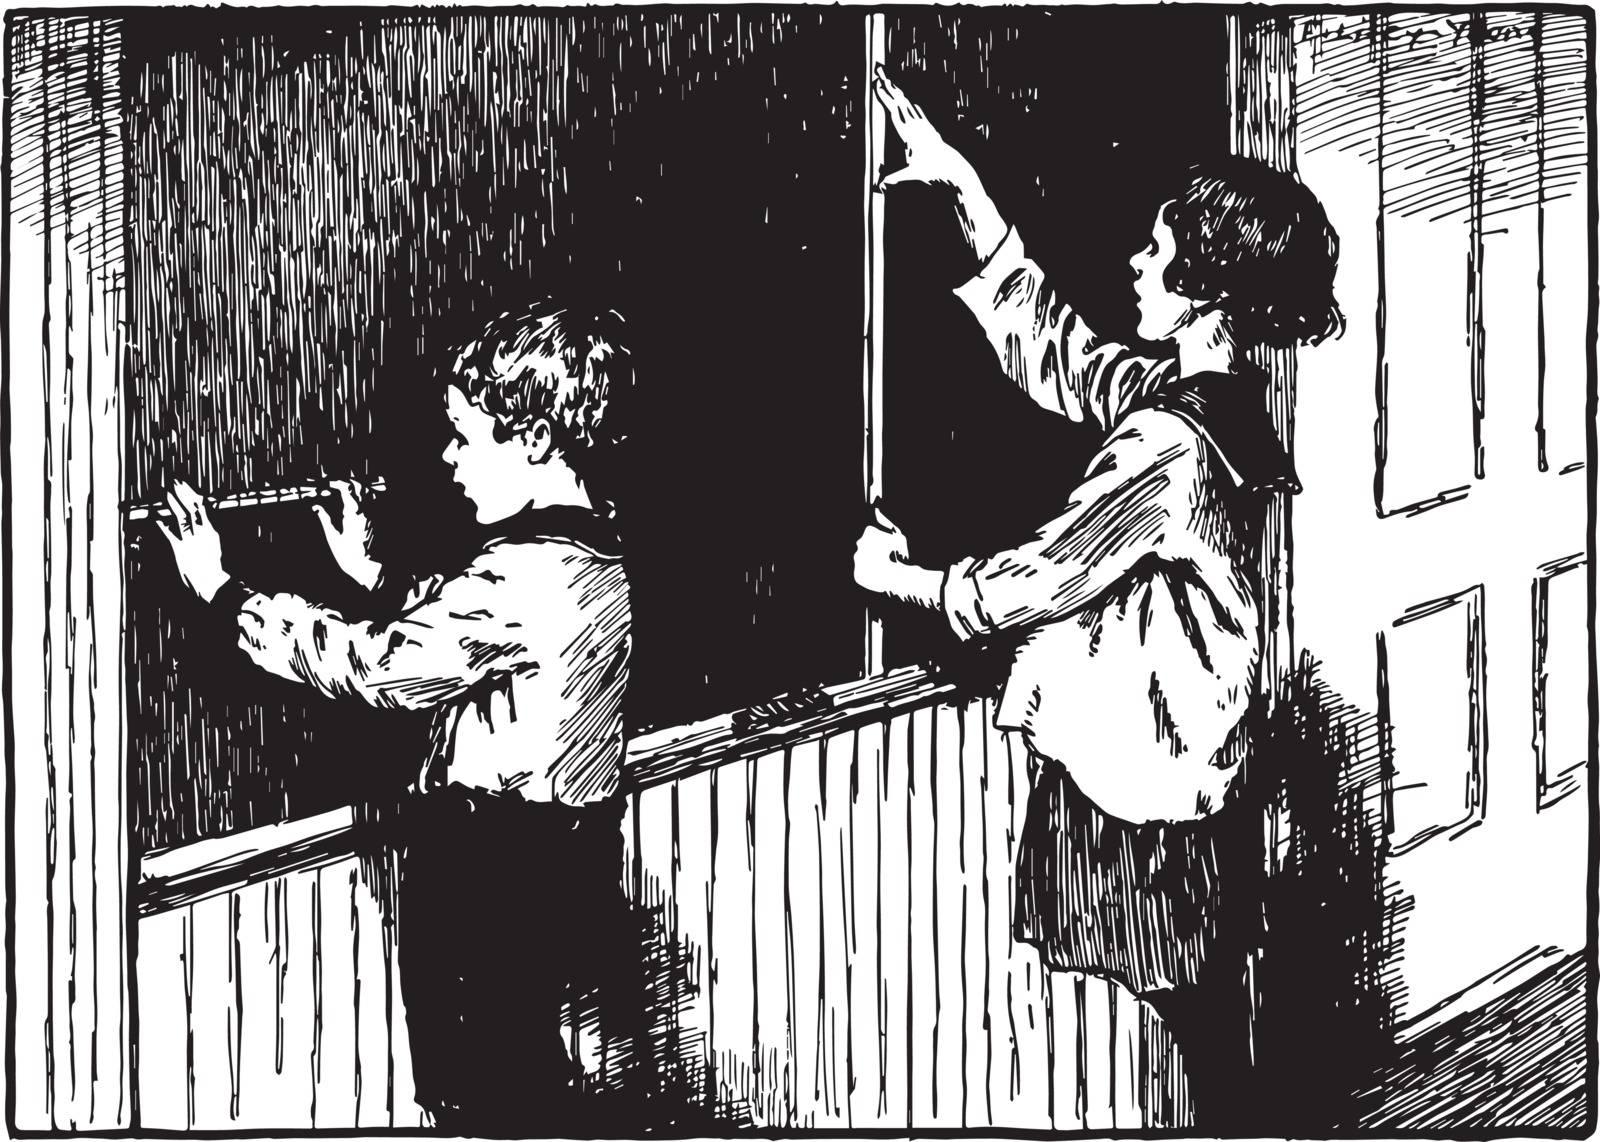 Measuring the blackboard using a ruler, chalk board, children, classroom, Ruler, vintage line drawing or engraving illustration.